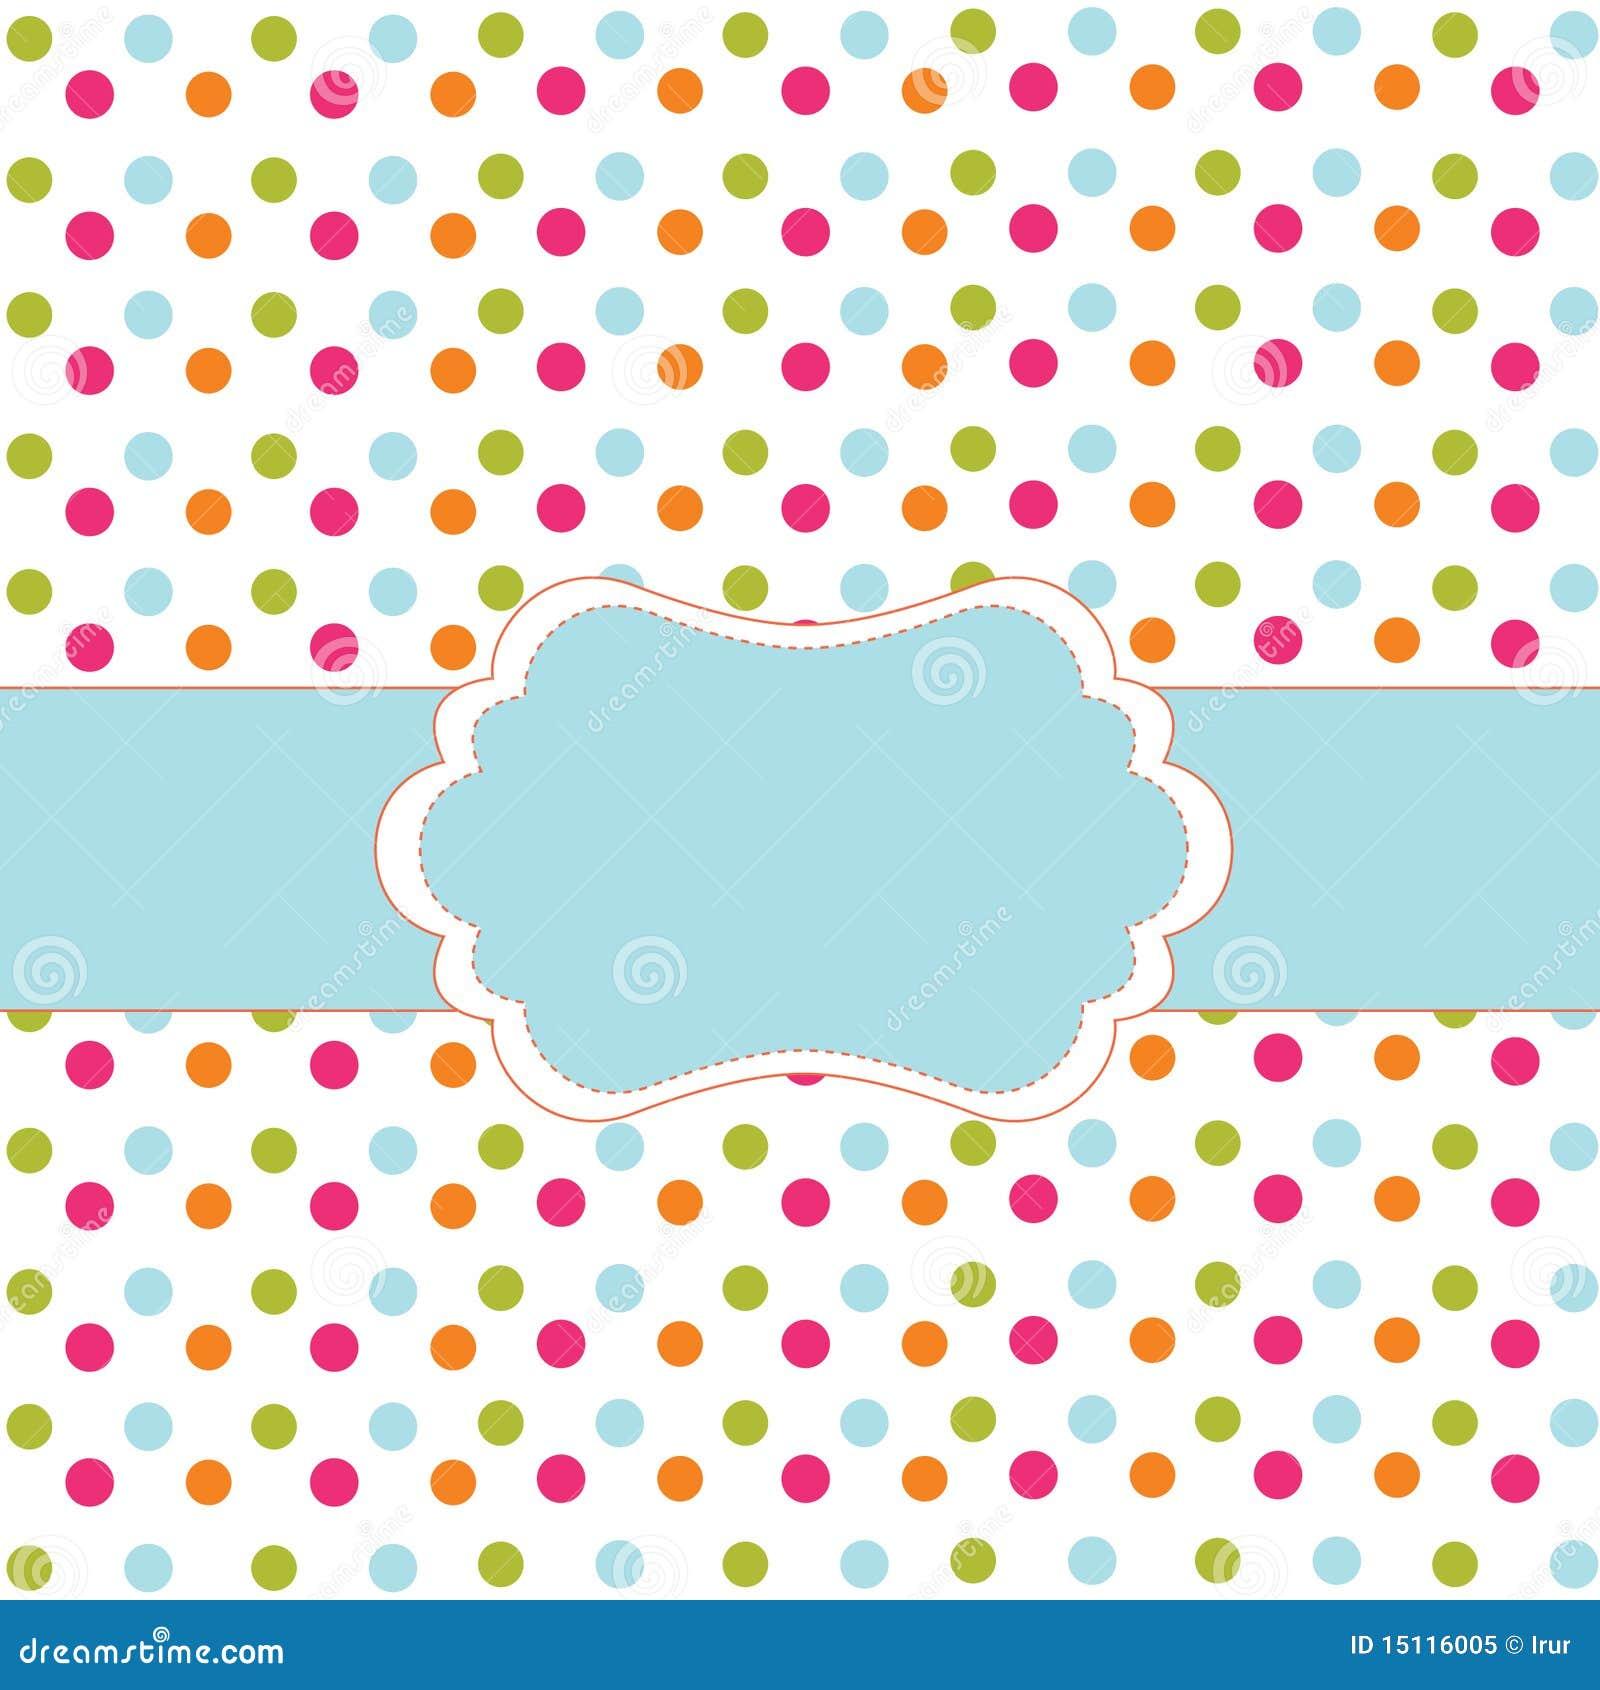 designs images polka dots - photo #47